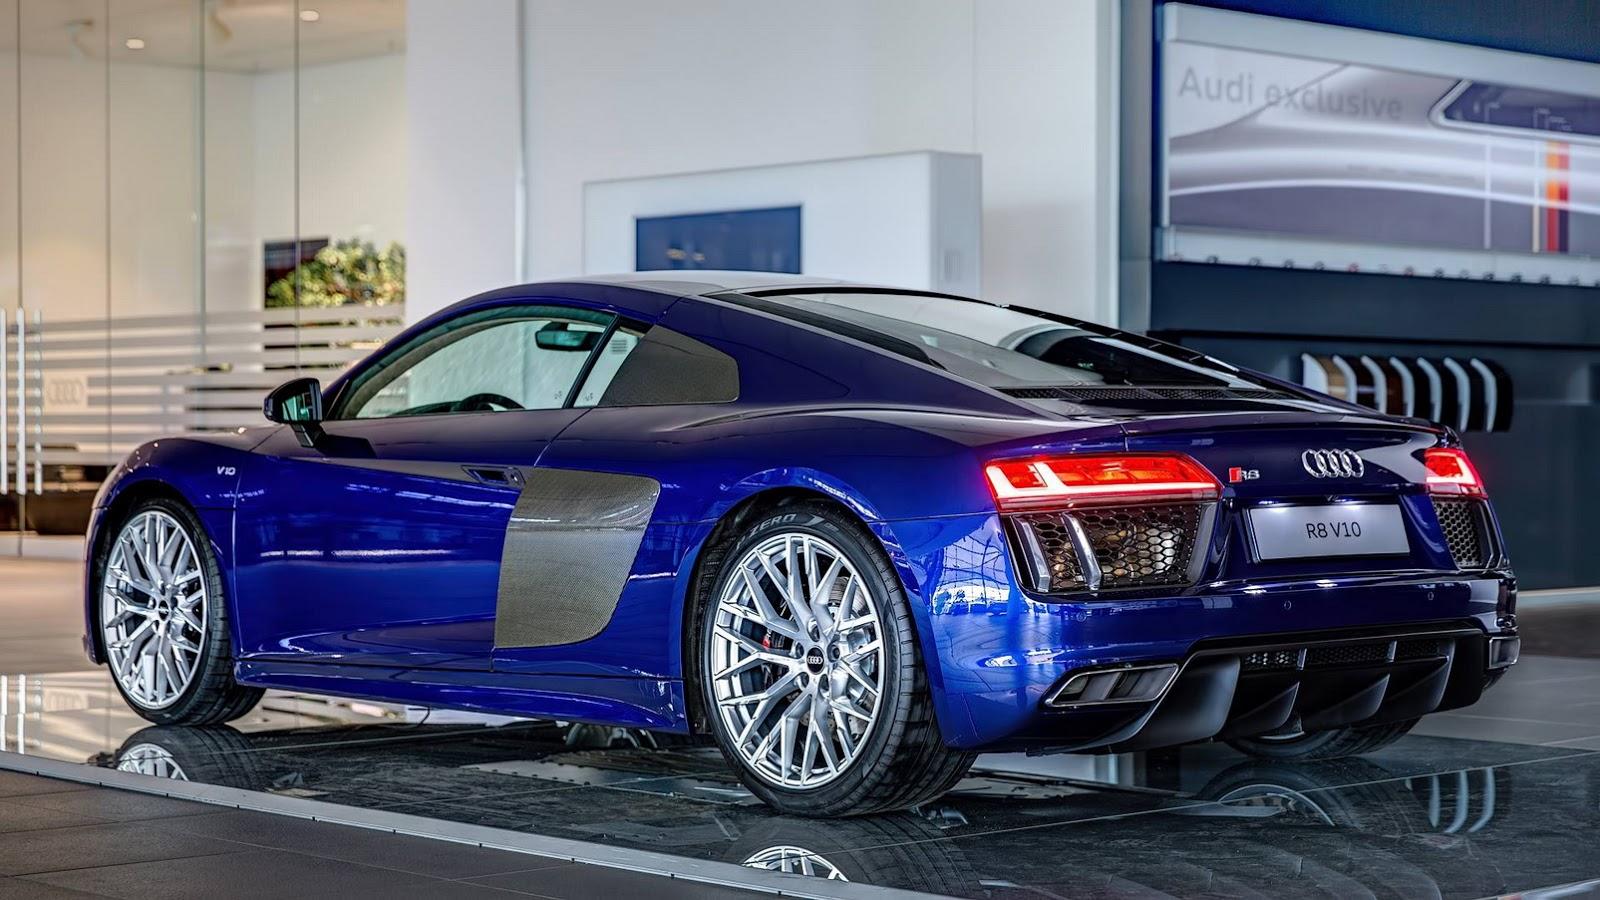 Beautiful Blue 2016 Audi R8 V10 In Germany Gtspirit